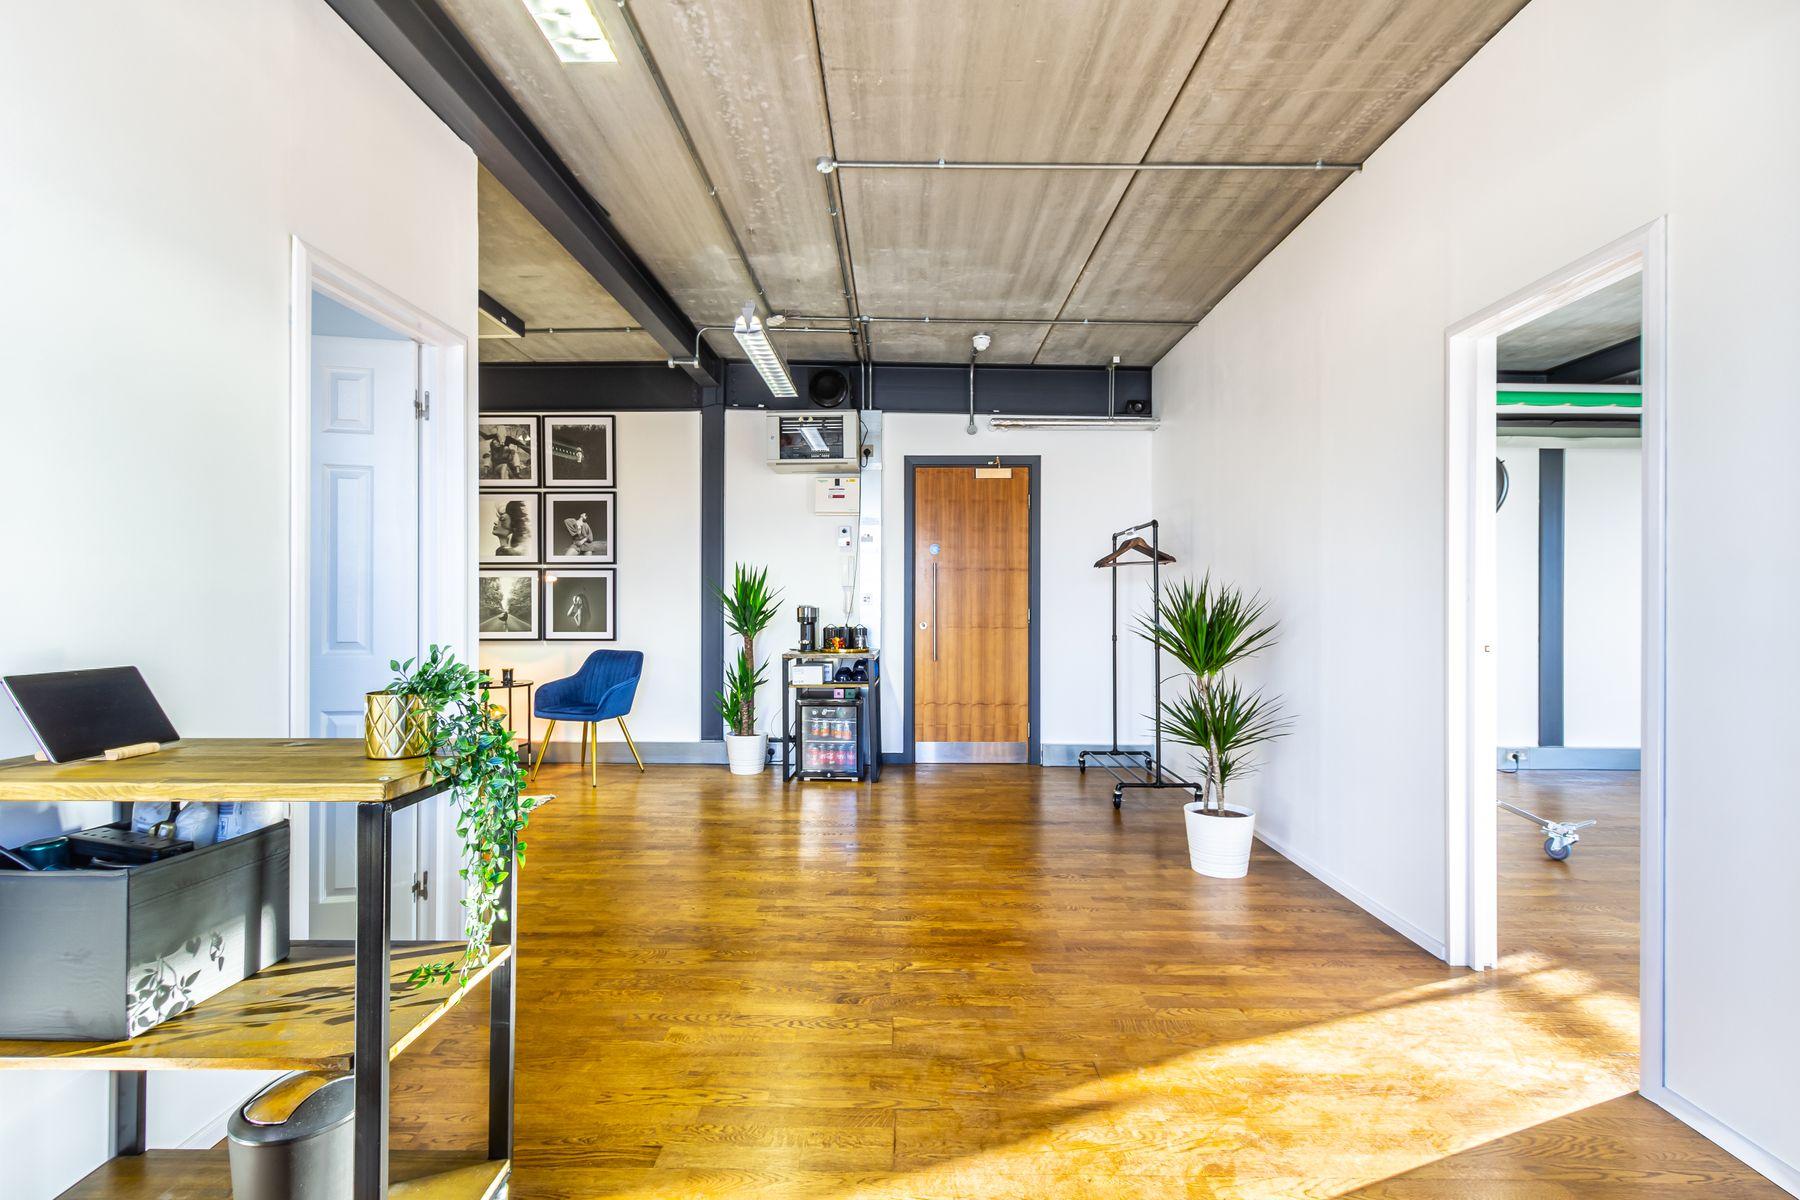 Photography / Video Studio London